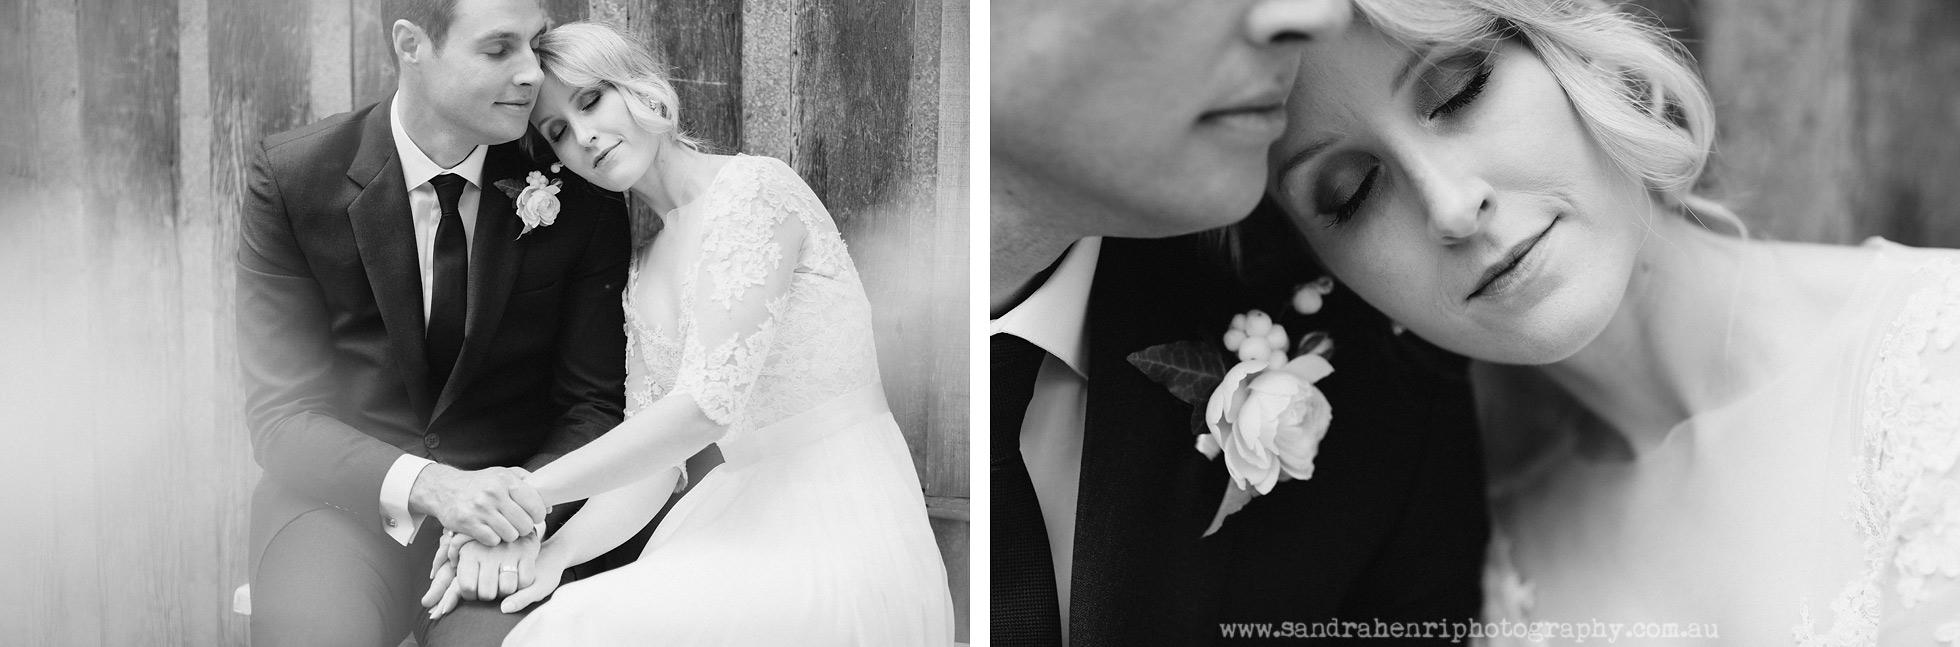 Roberts-Restaurant-garden-wedding-images-30.jpg